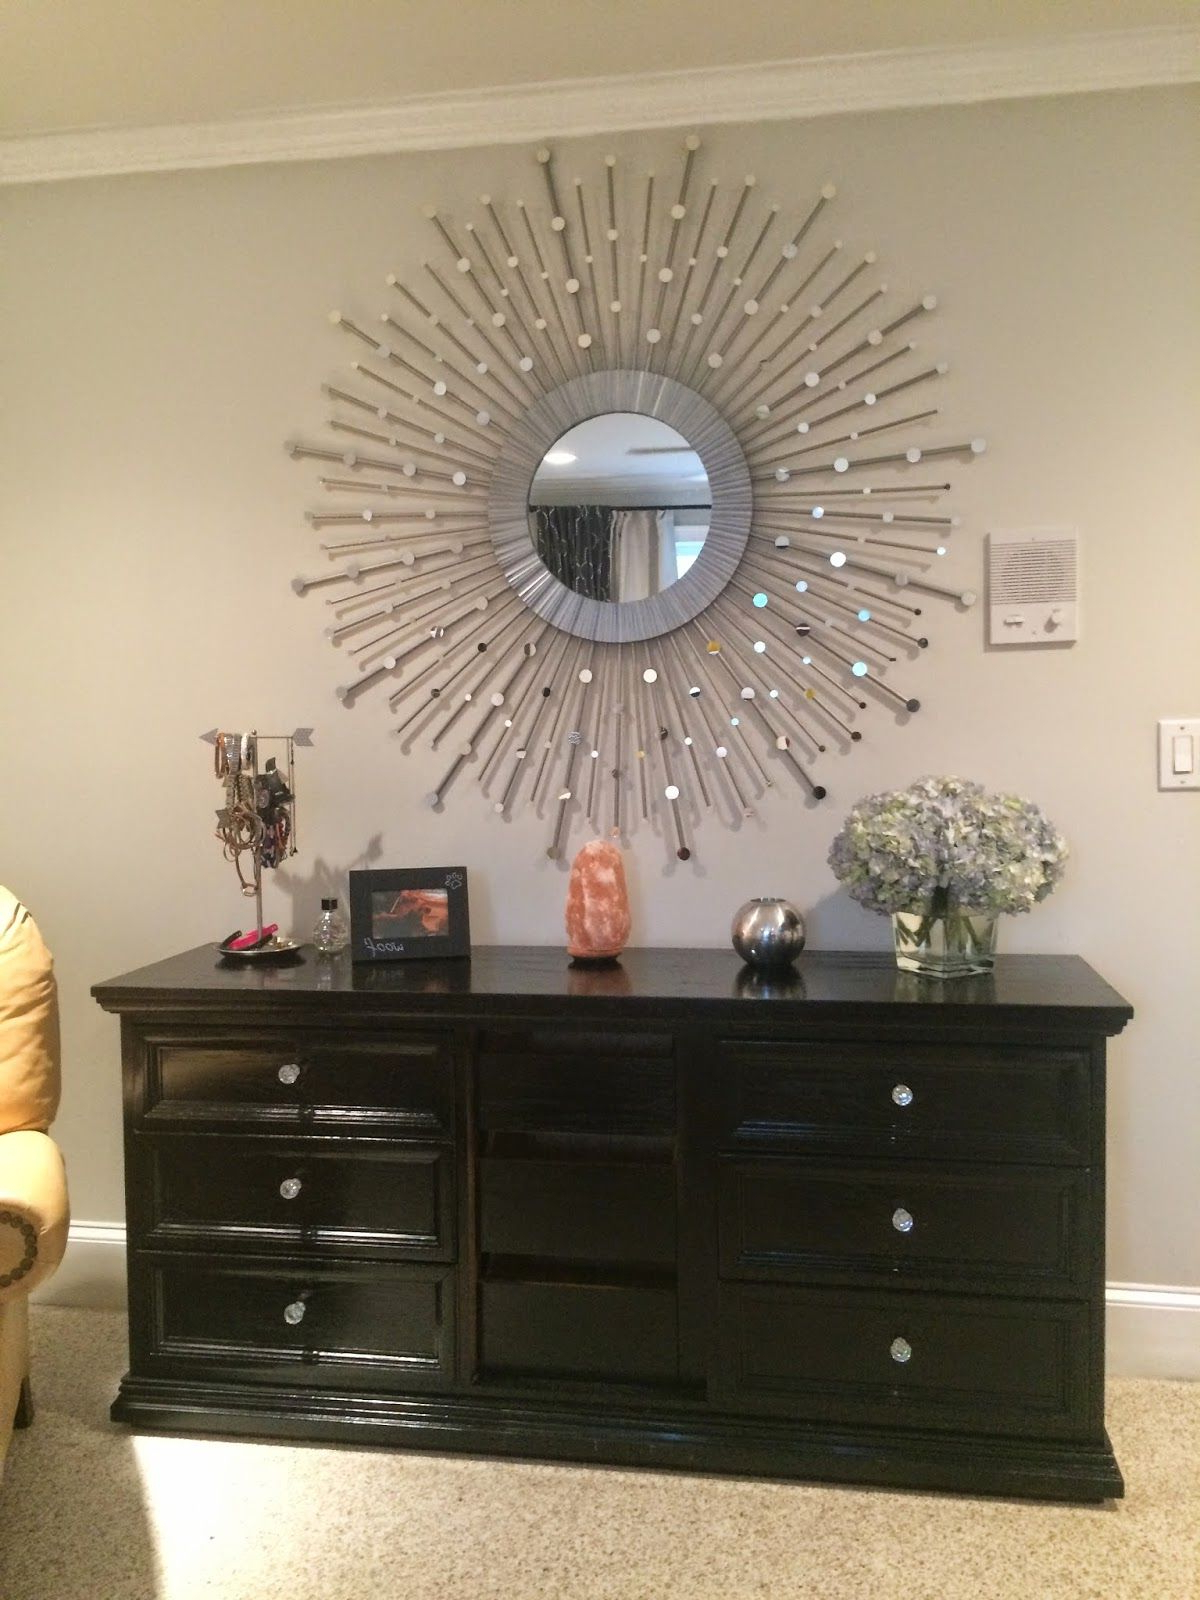 Easy Diy Sunburst Mirror (Gallery 20 of 20)